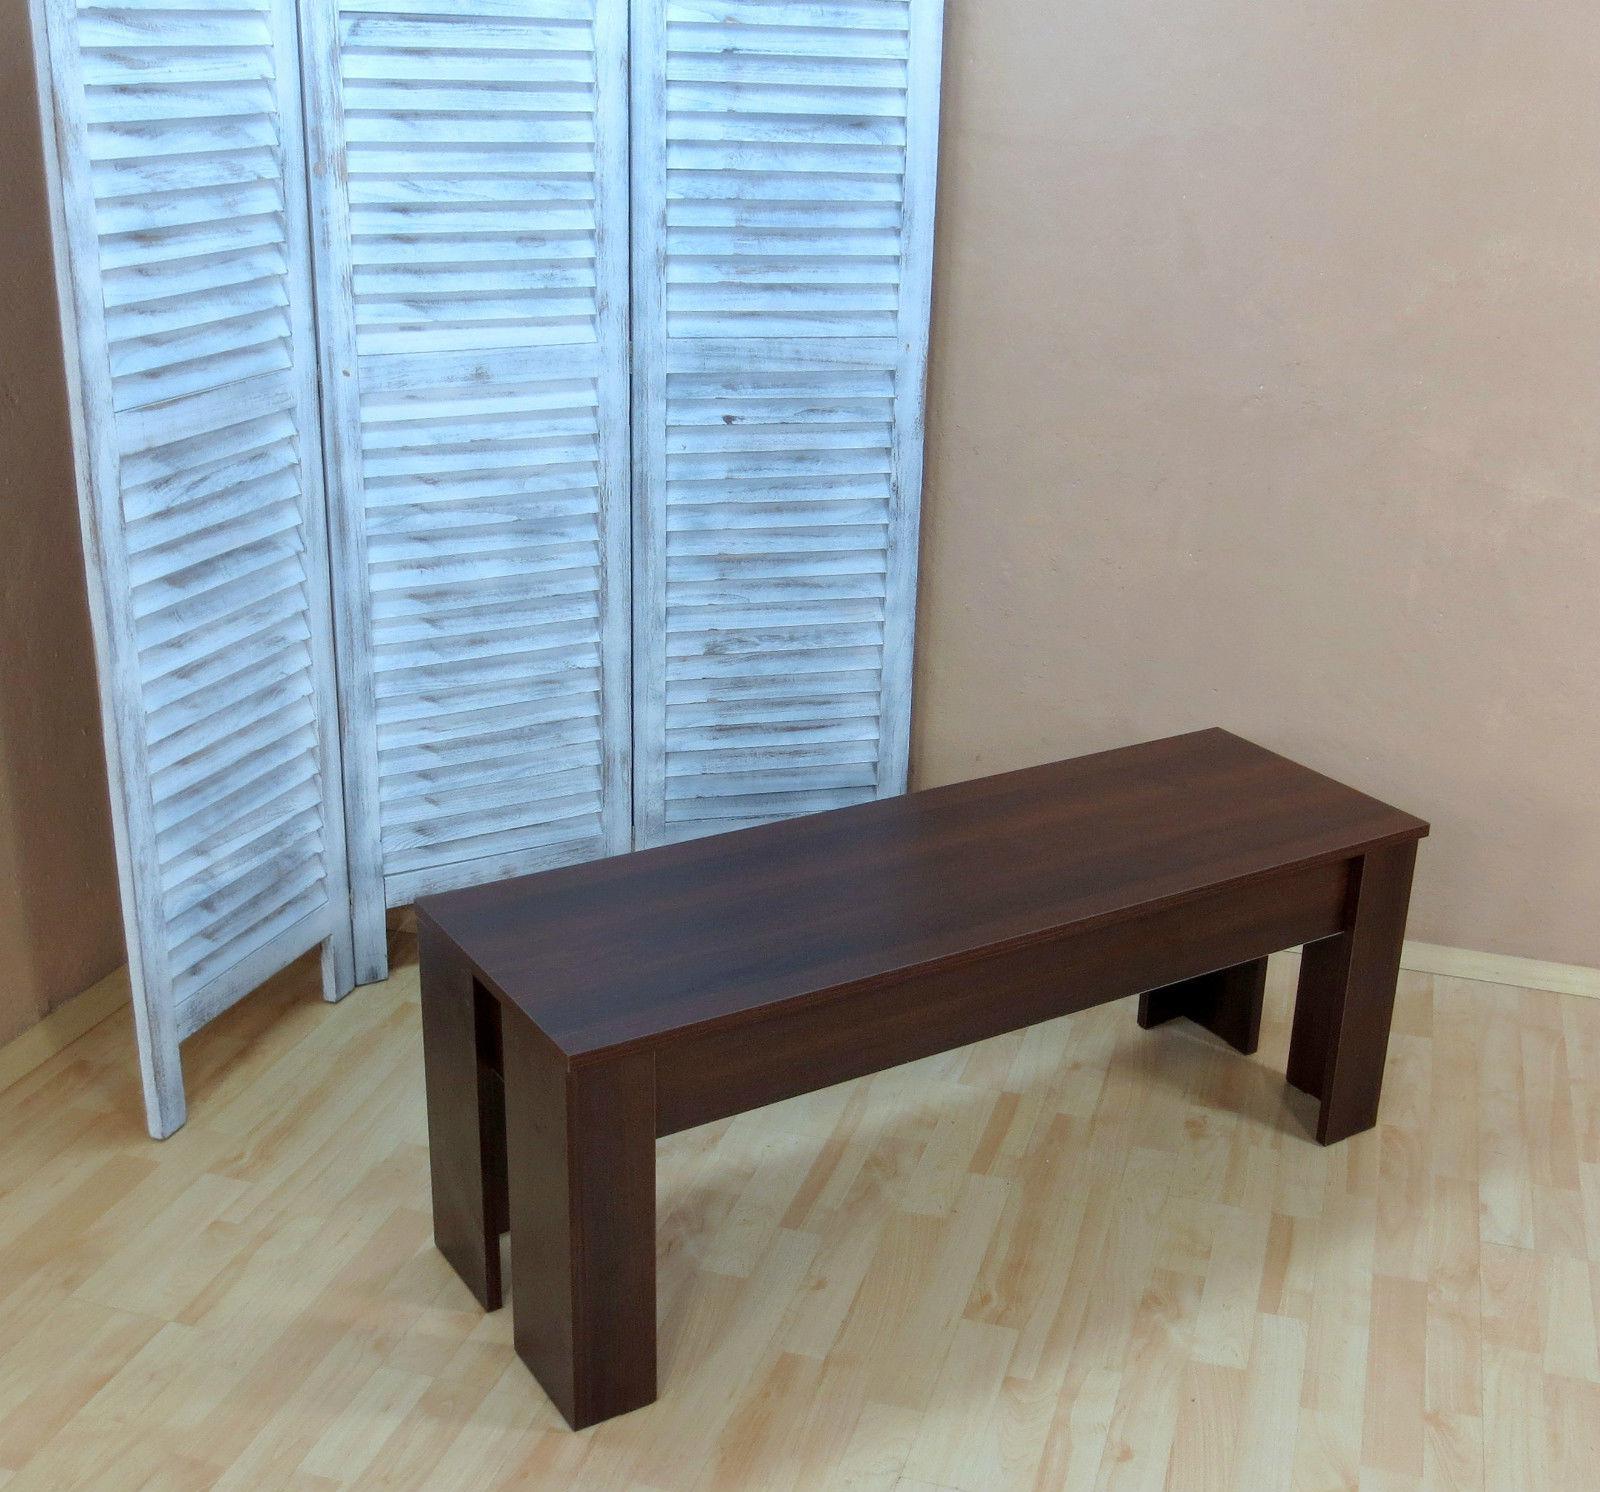 sitzbank sonoma eiche top finebuy schuhbank luisa paar. Black Bedroom Furniture Sets. Home Design Ideas